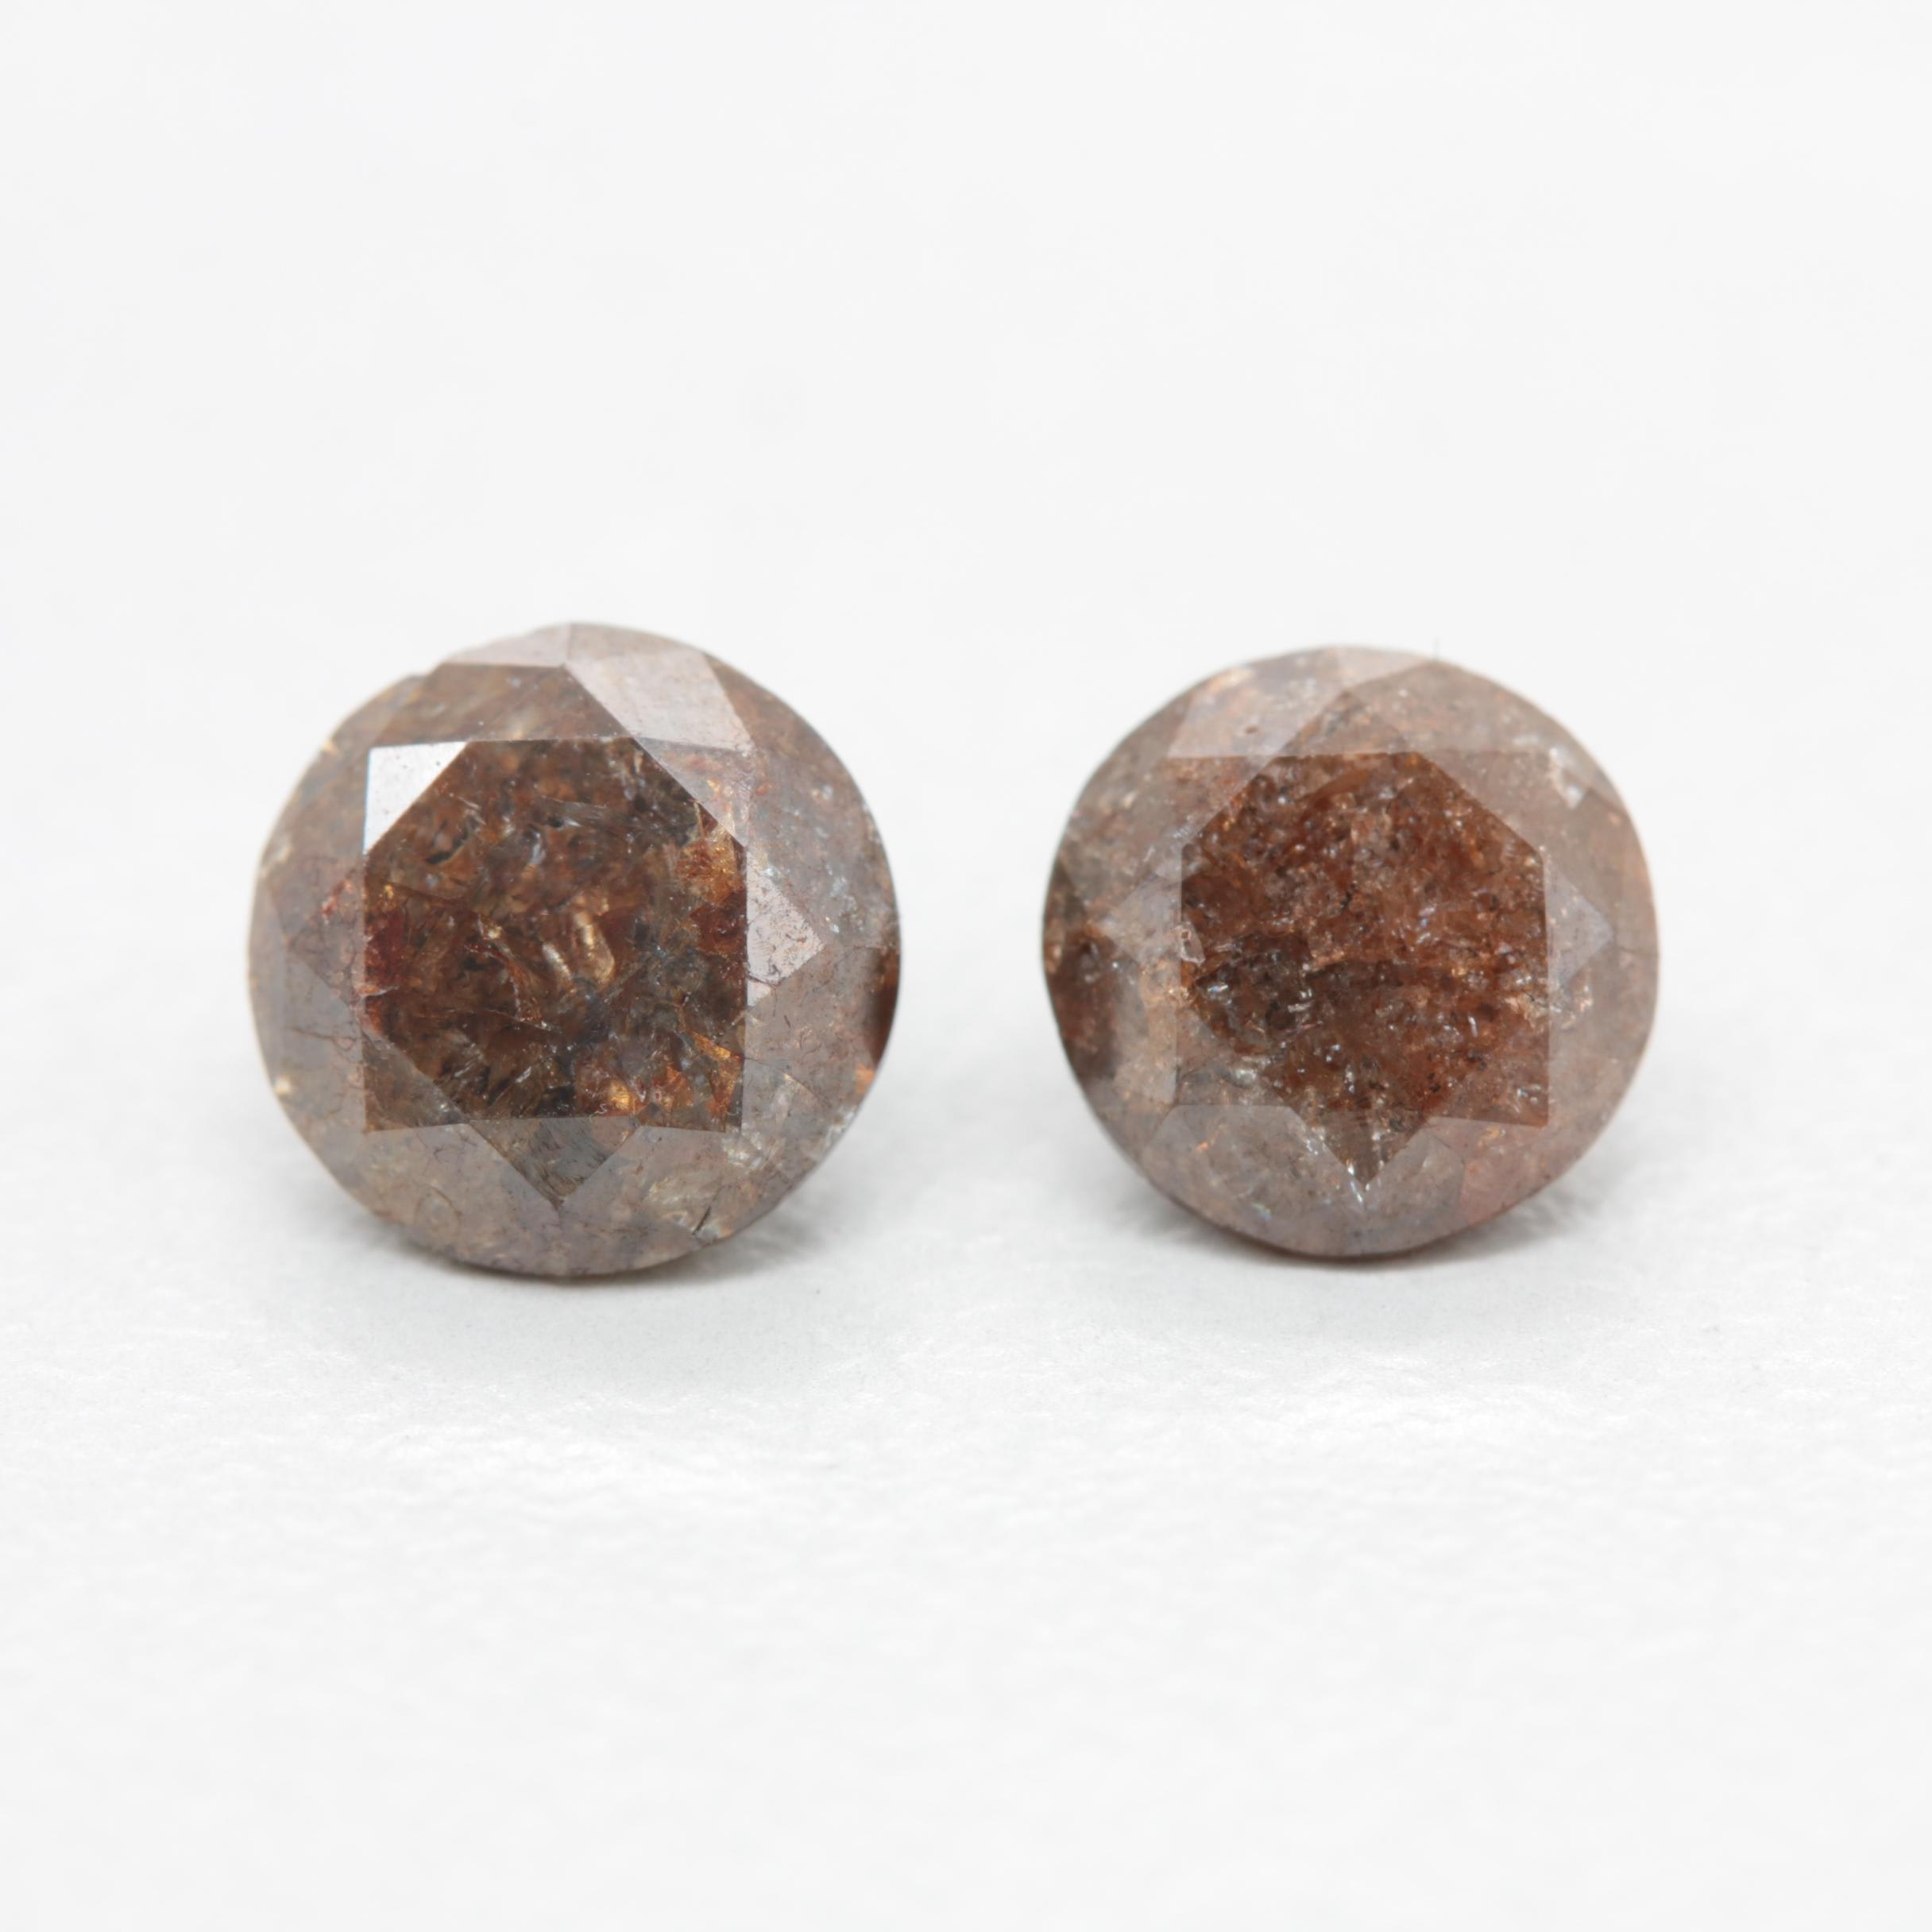 Loose 2.67 CTW Diamonds